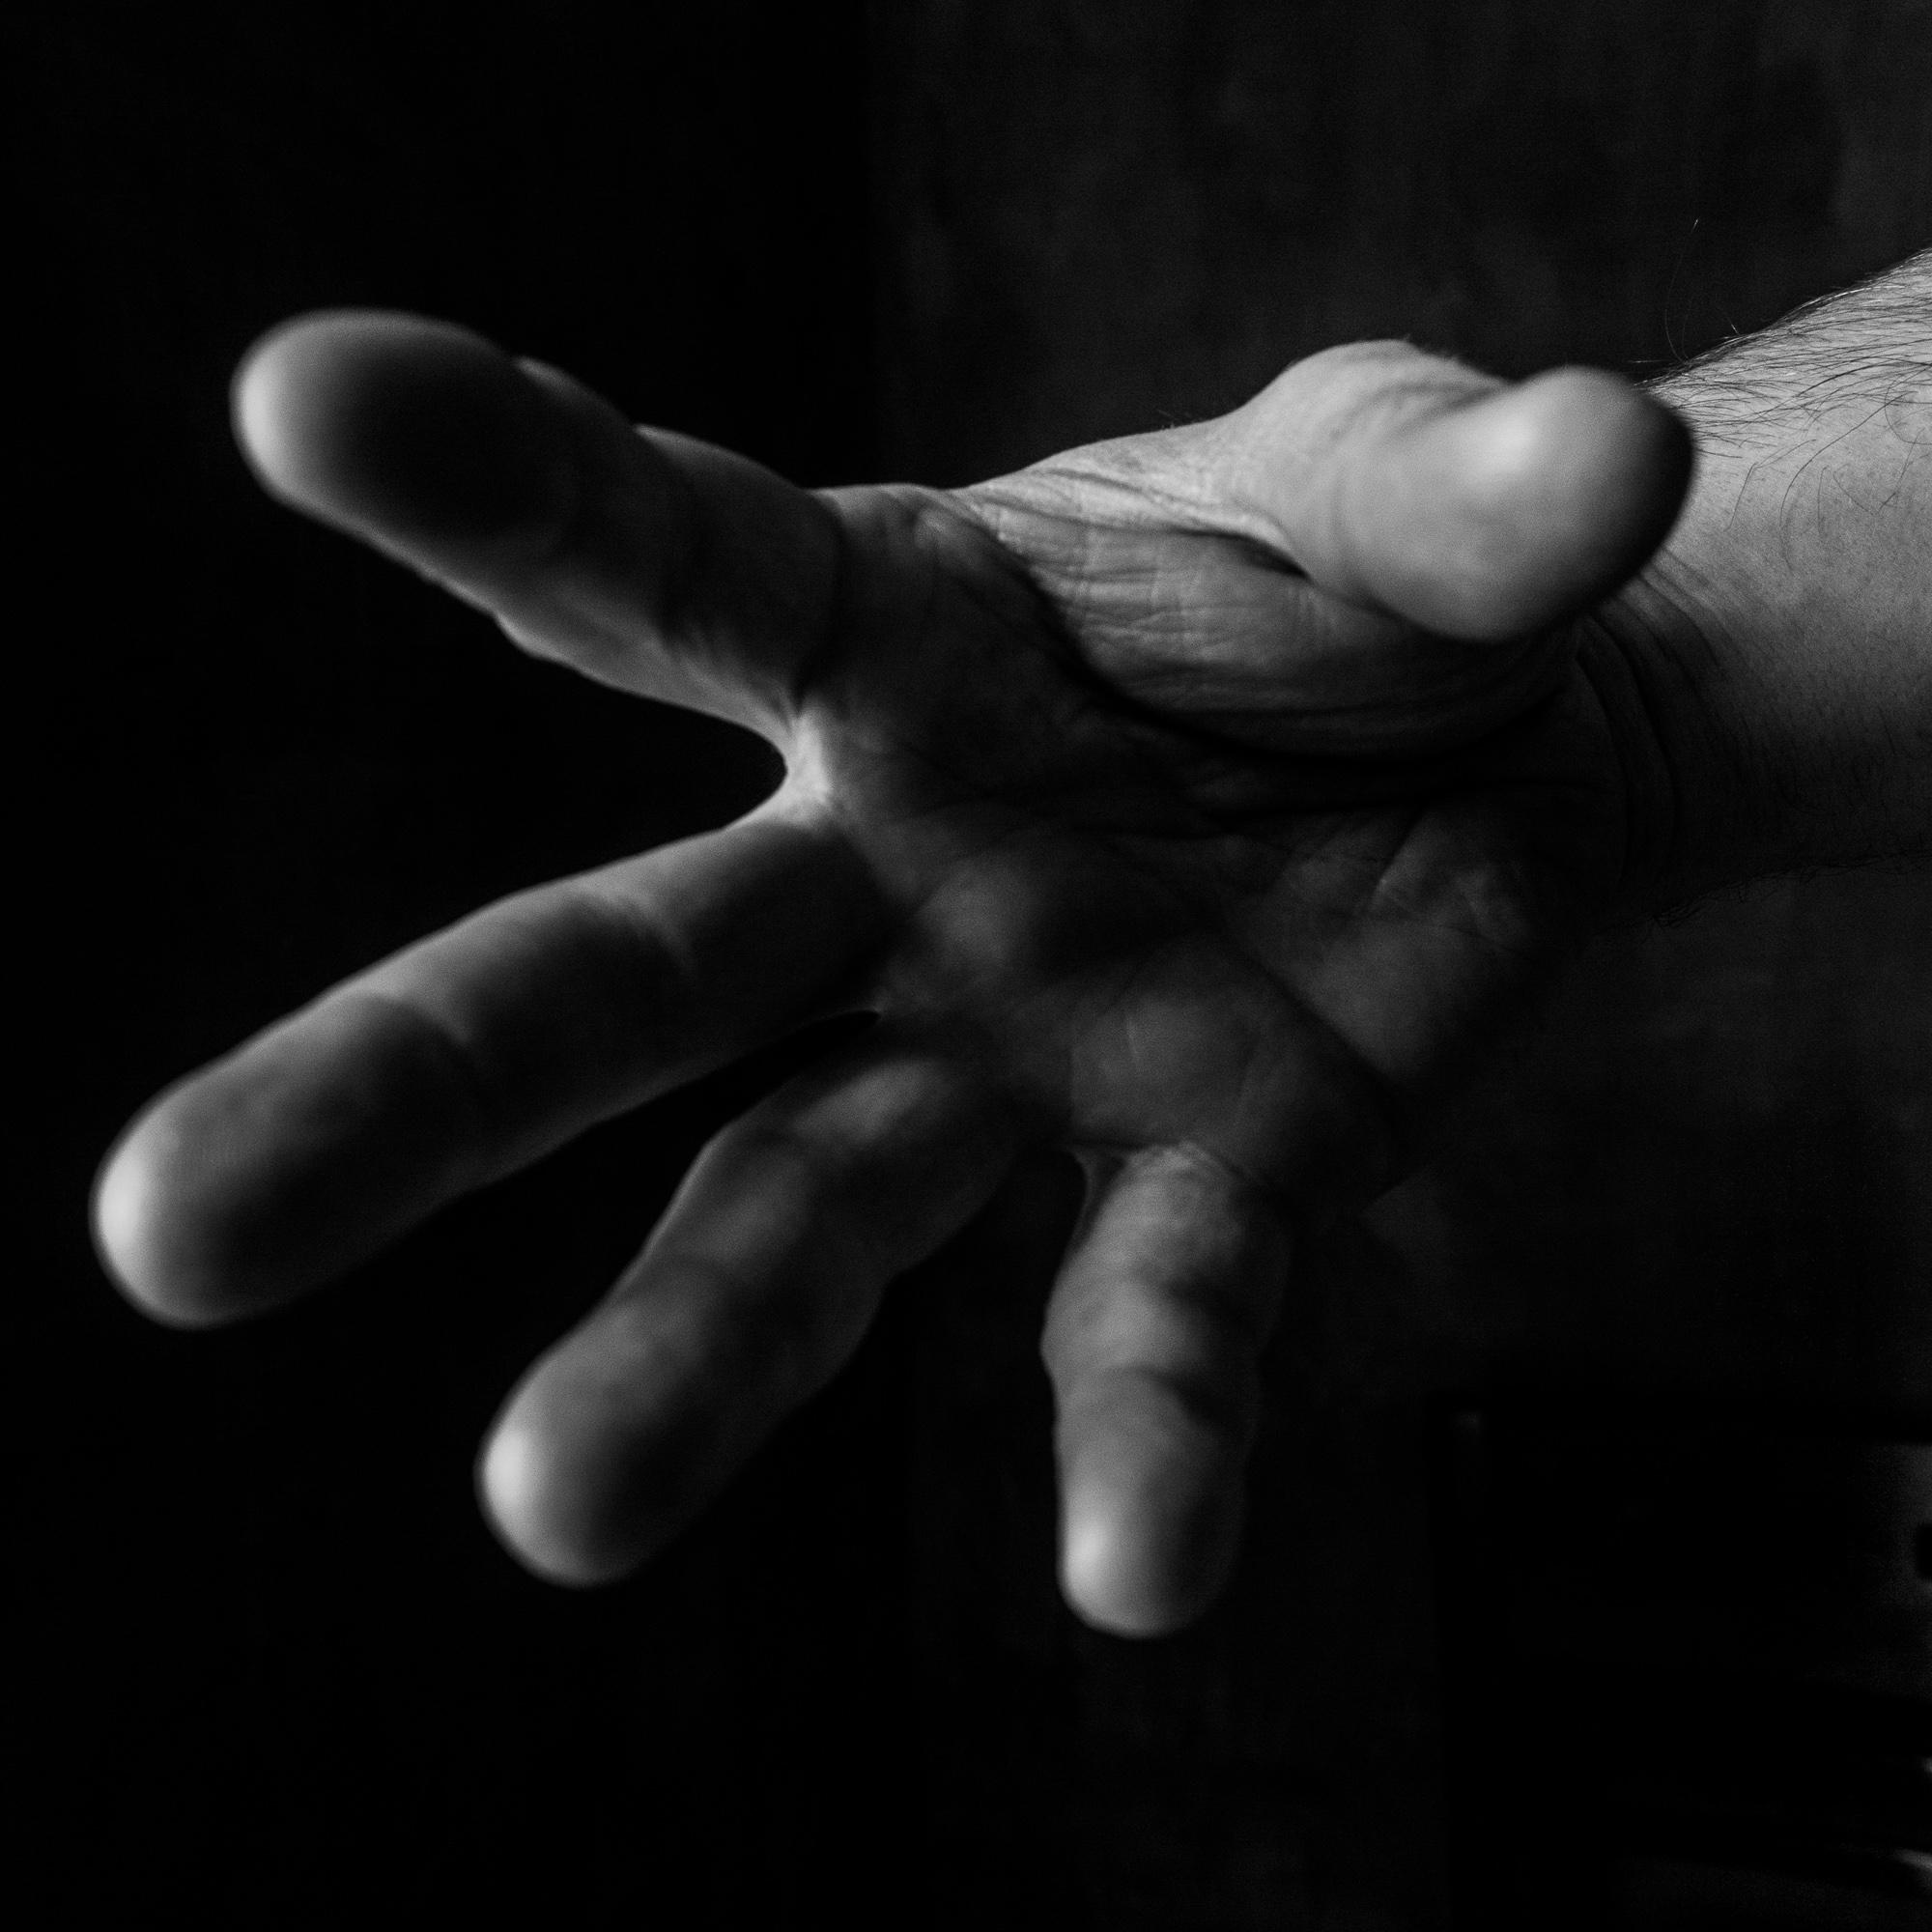 Hand26-102.jpg